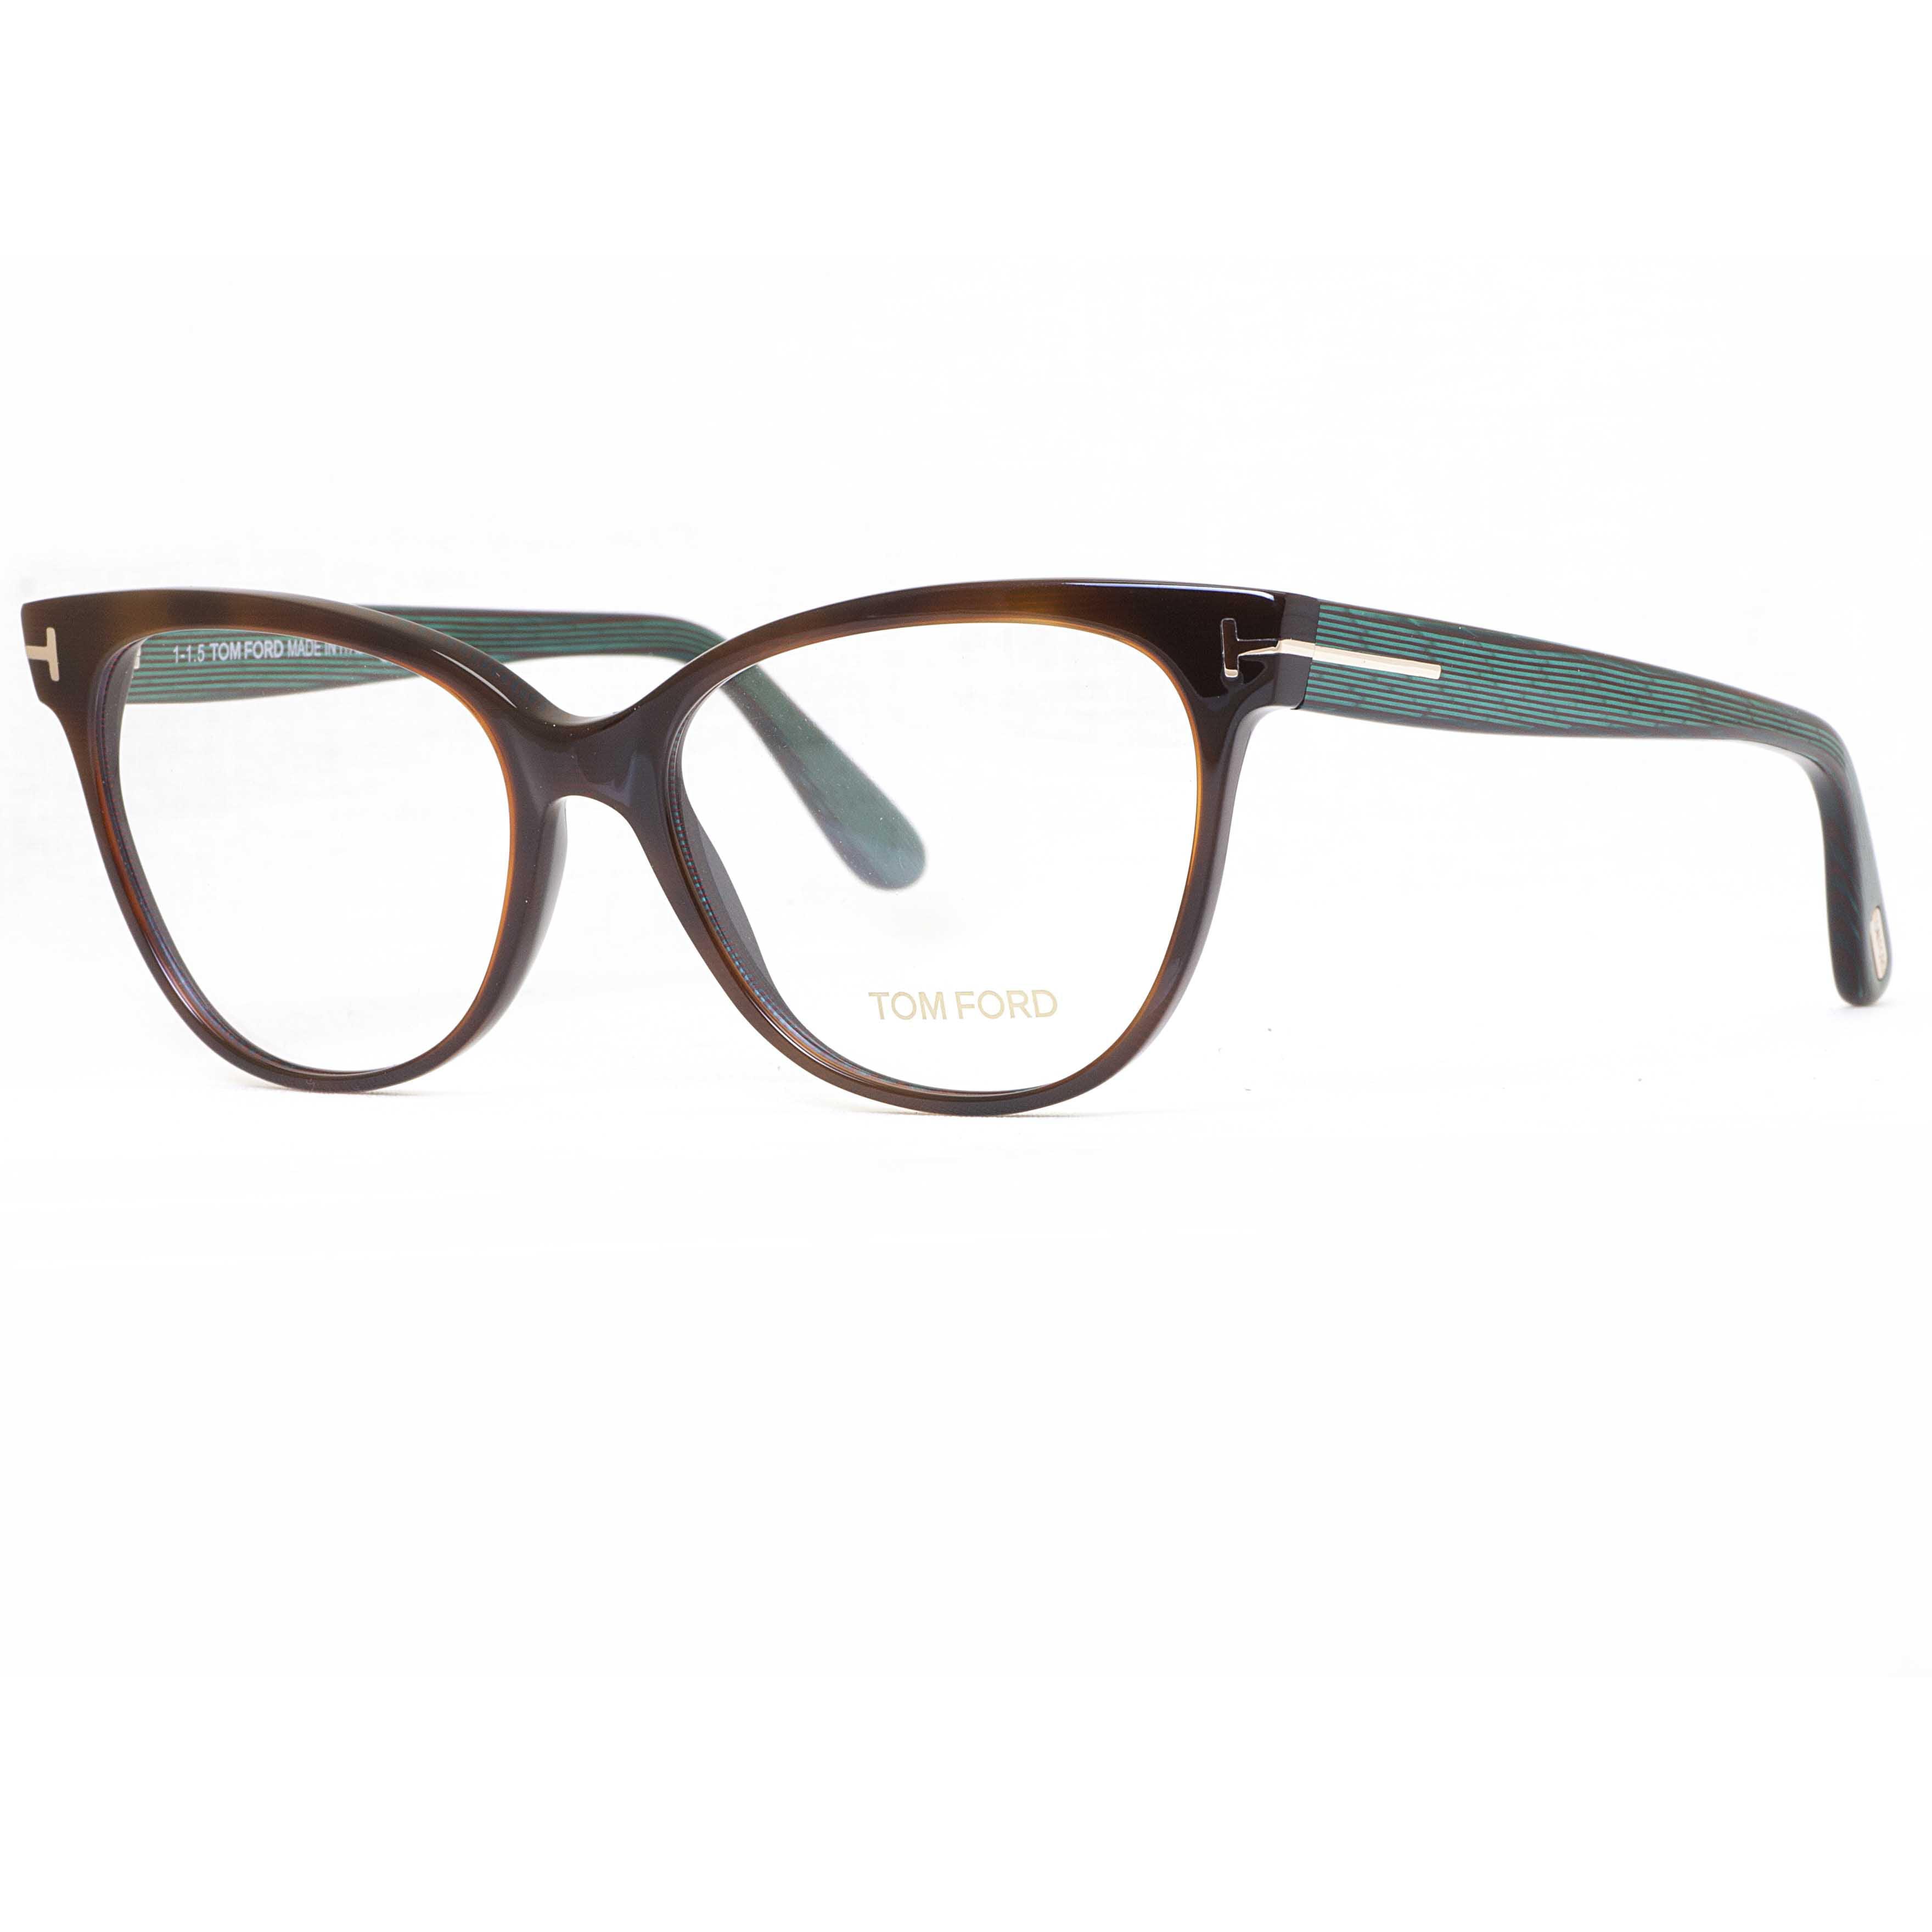 tom ford tf5291 052 55mm brown green stripes cat